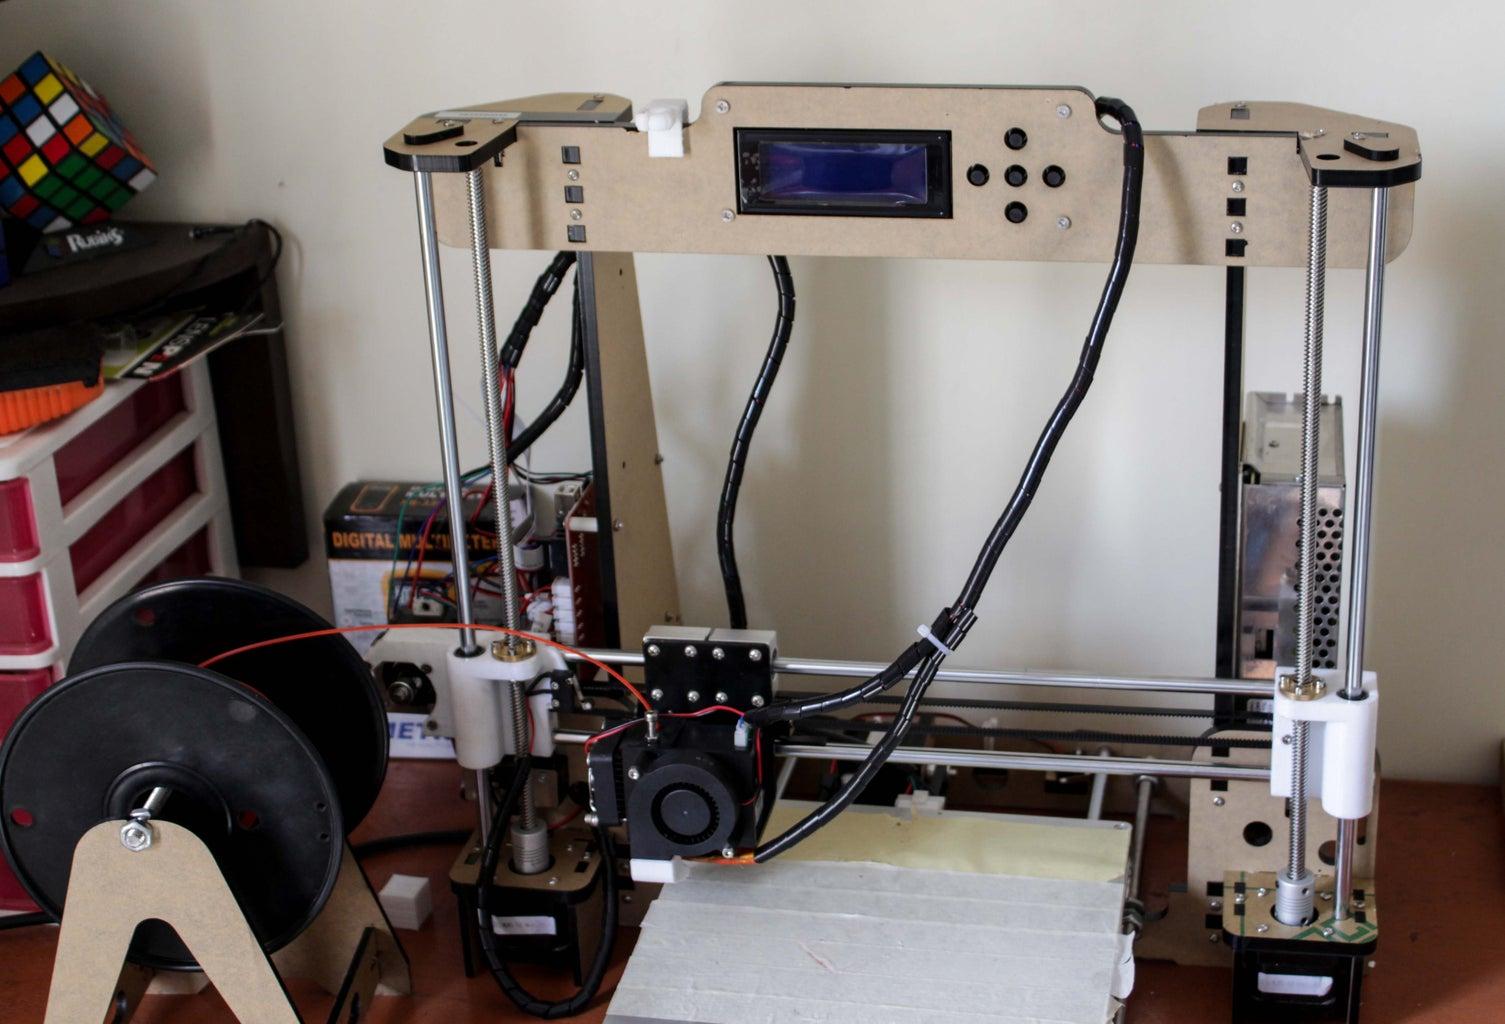 Building a 3D Printer Under $200